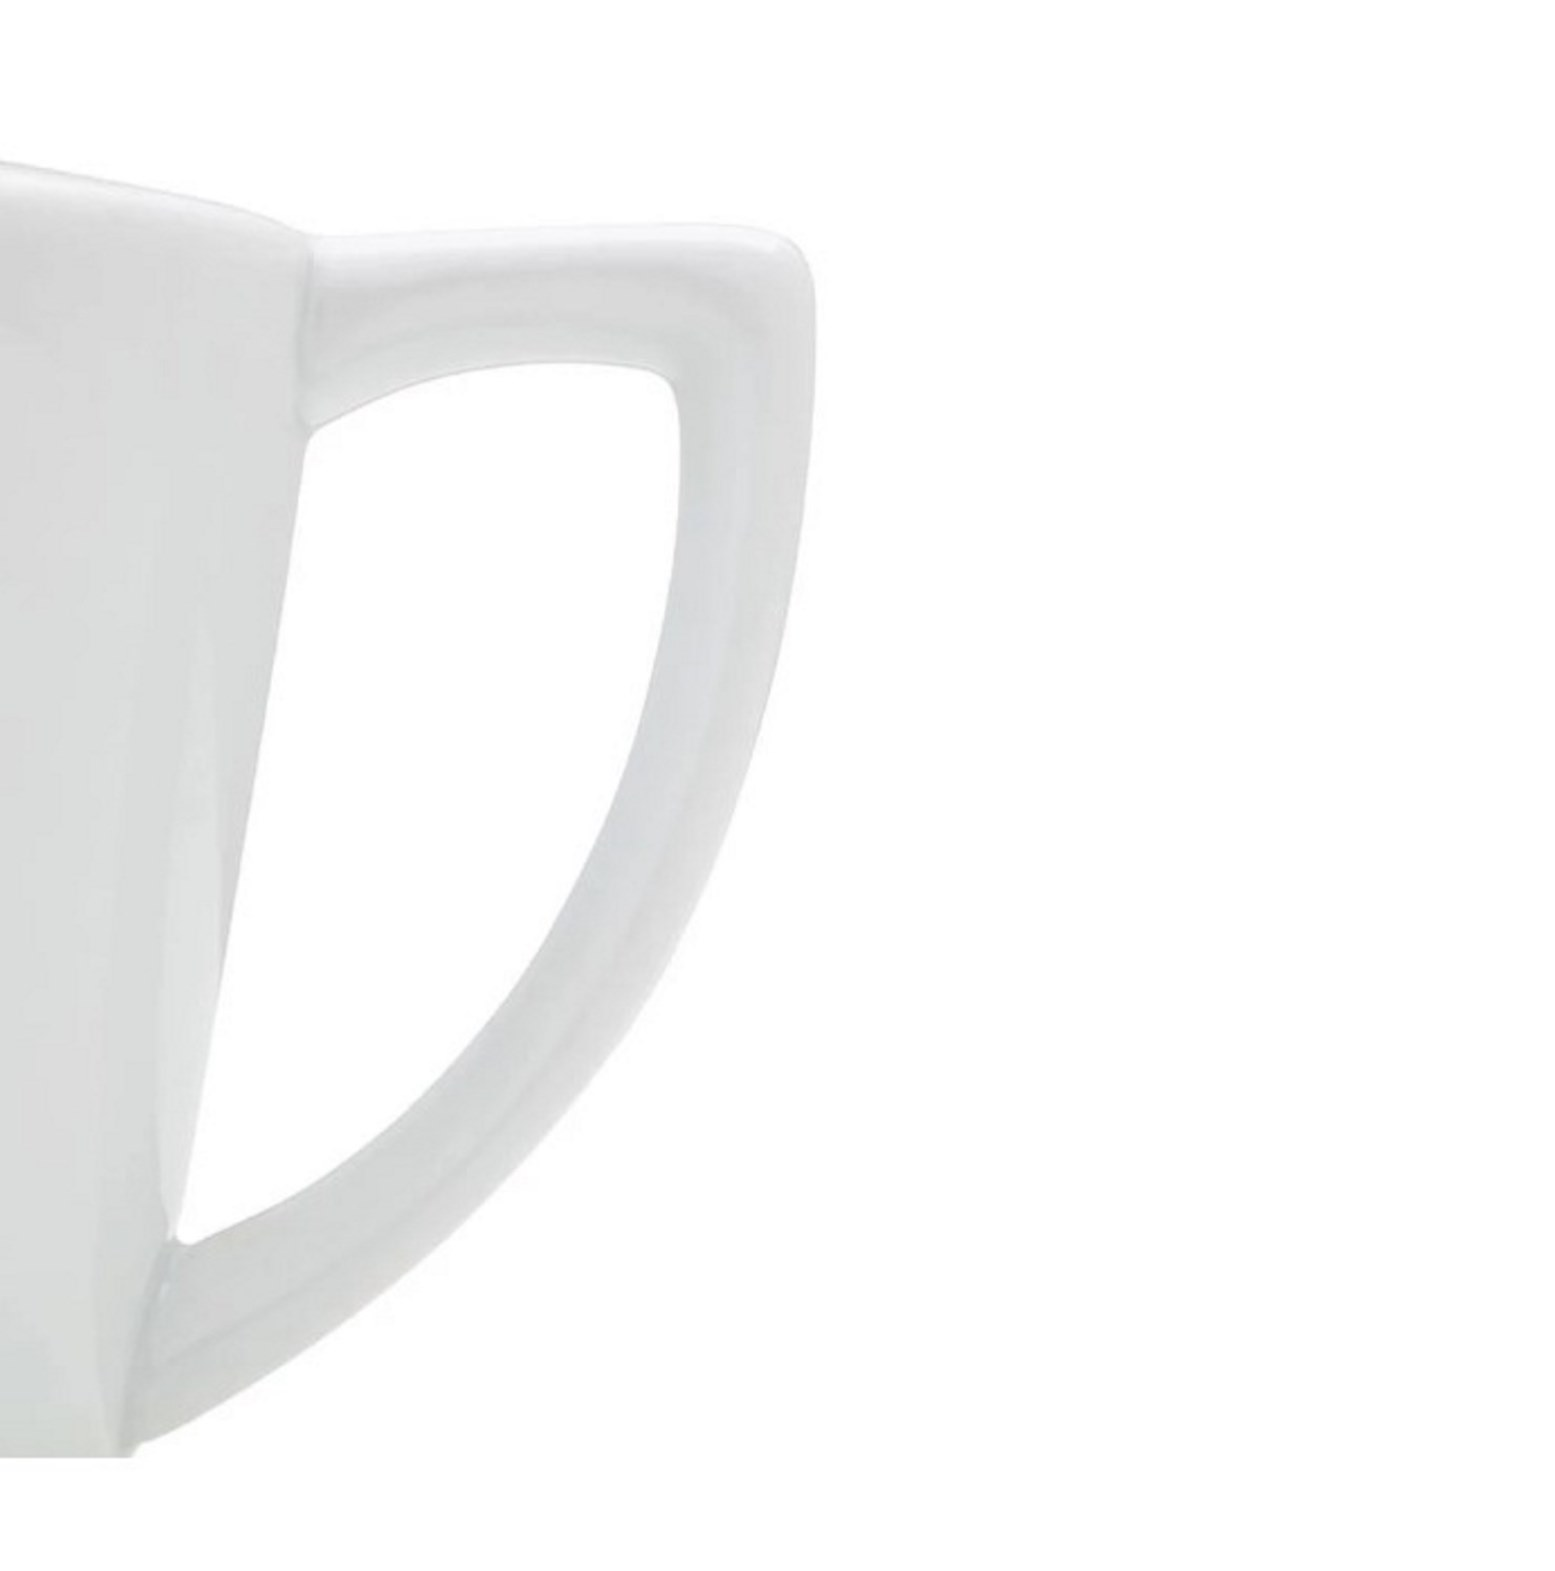 Чайный набор: чайник и 2 чашки Viva Scandinavia INFUSION, объем: 1 л/0,25 л, бежевый, 3 предмета Viva Scandinavia V24121 фото 1